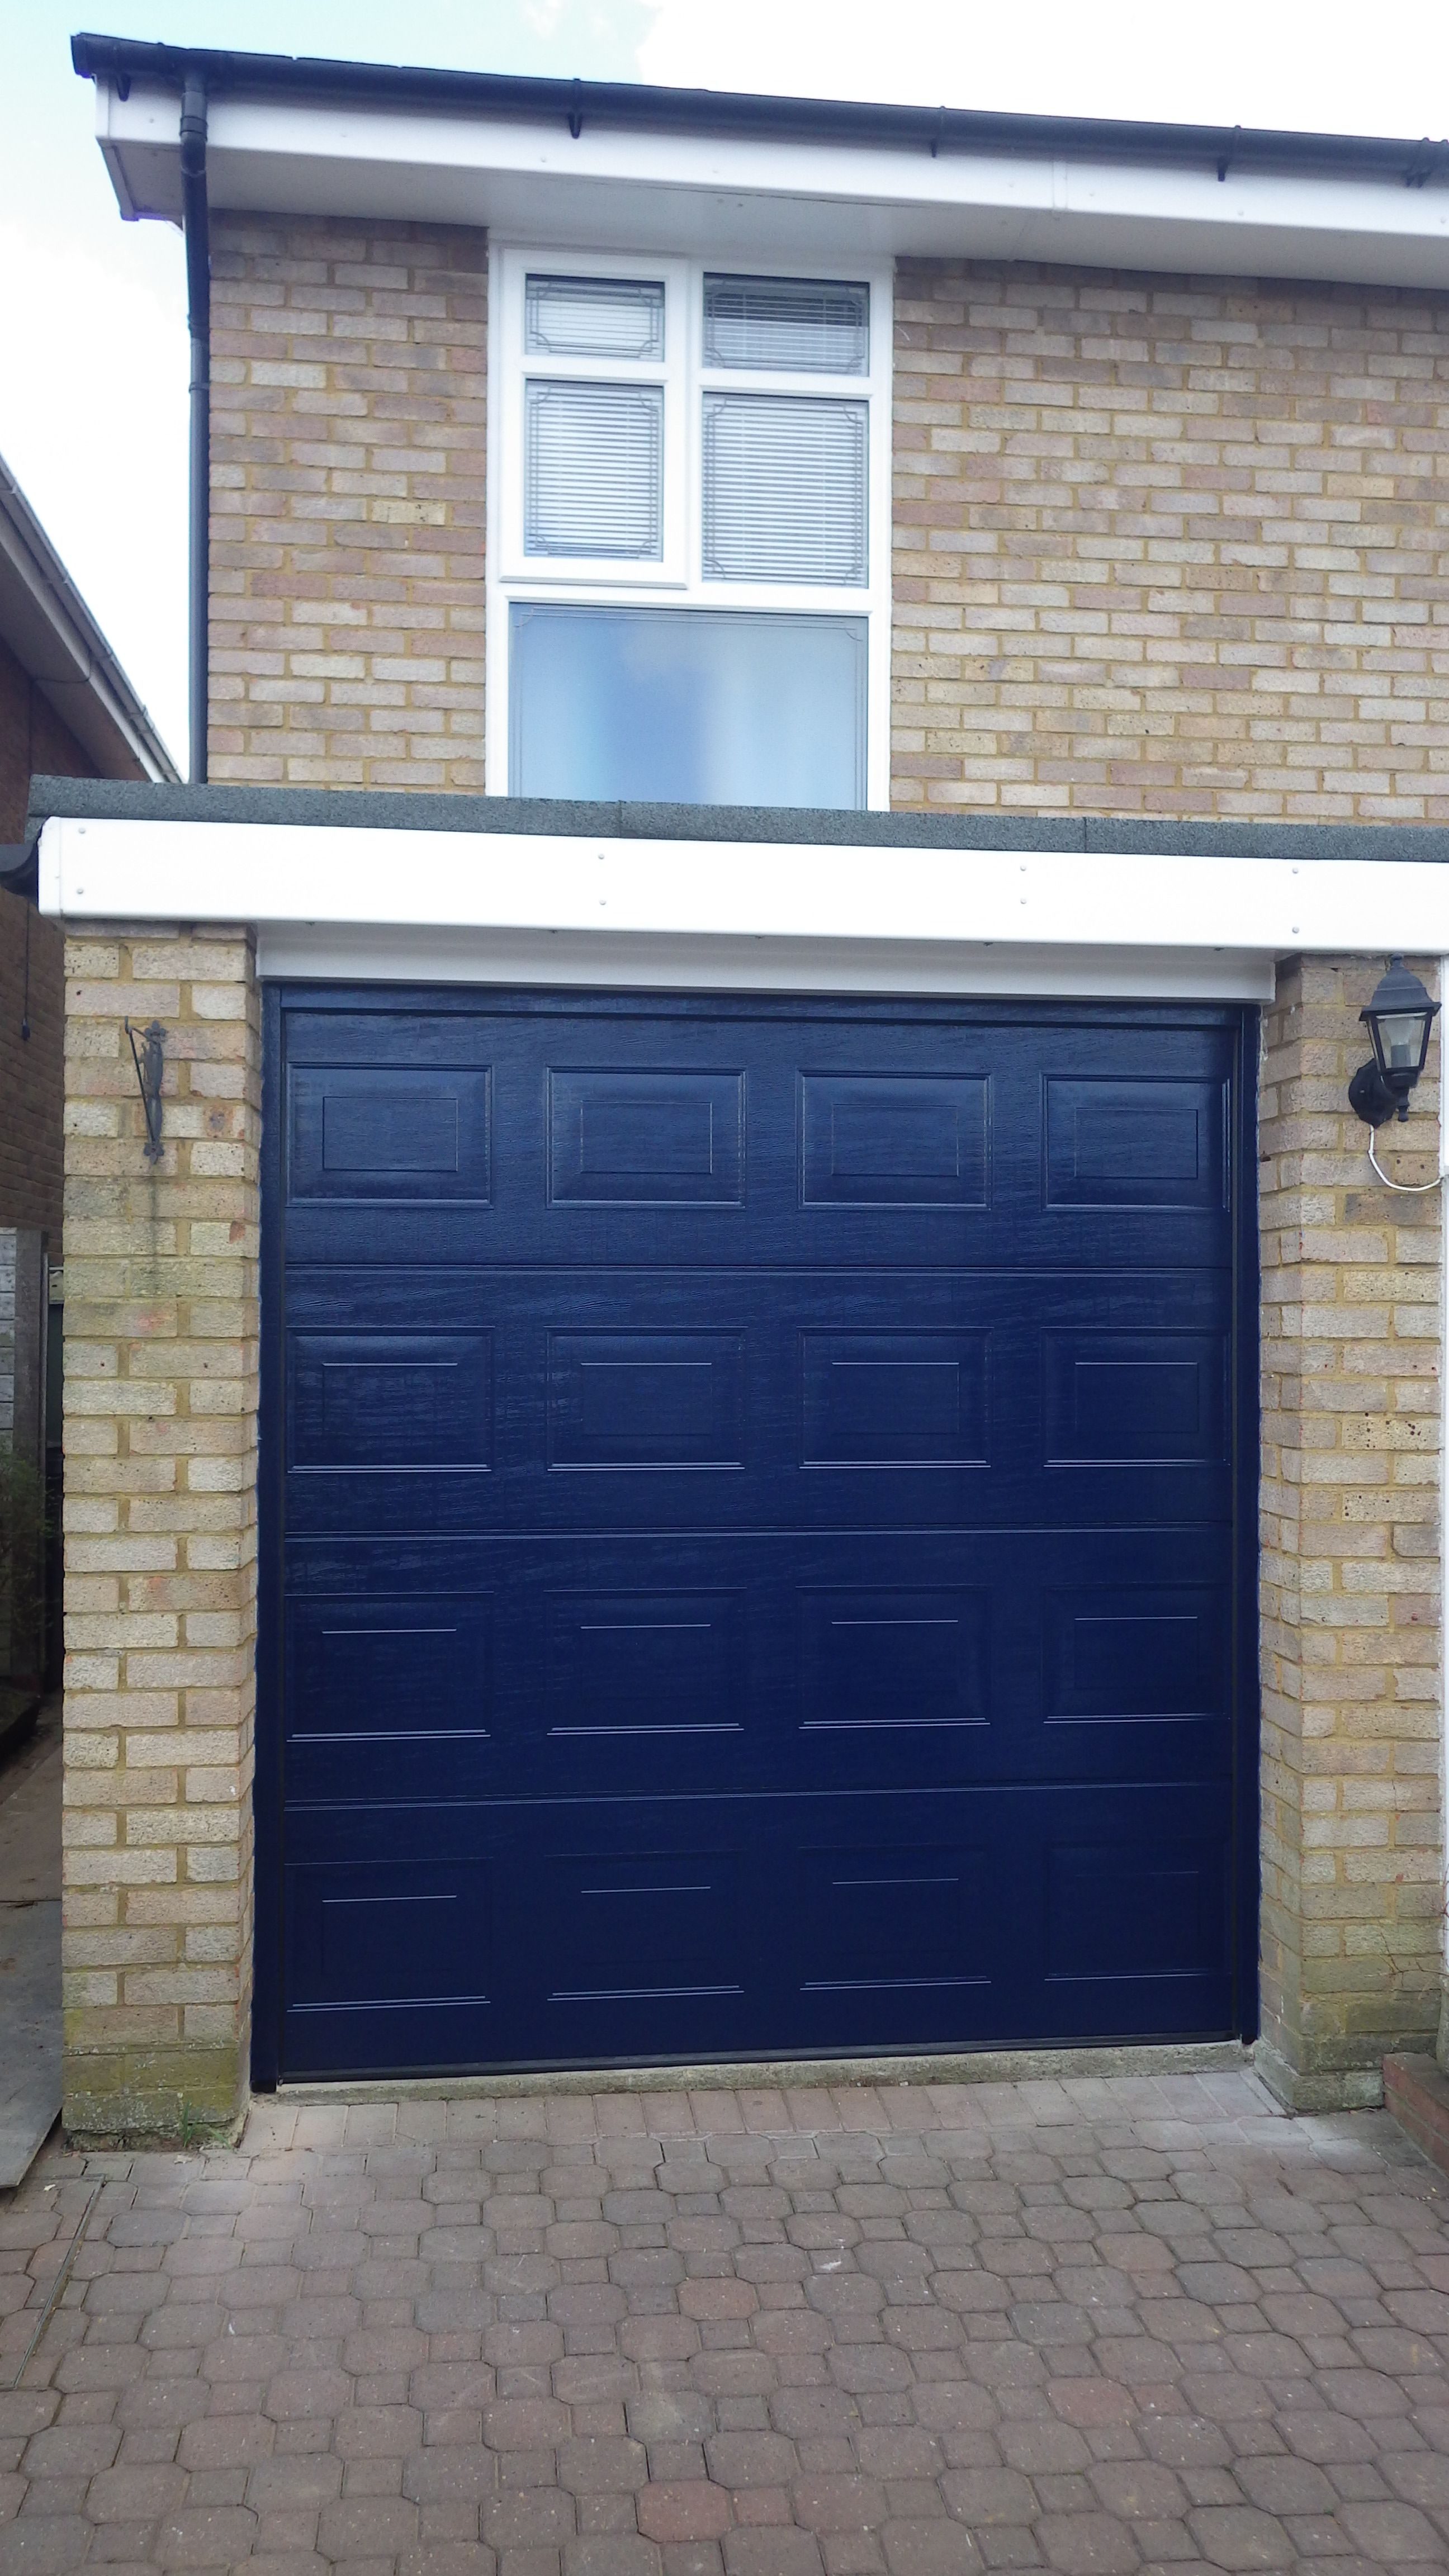 Hormann sectional s panelled woodgrain garage door in dark blue hormann sectional s panelled woodgrain garage door in dark blue rubansaba